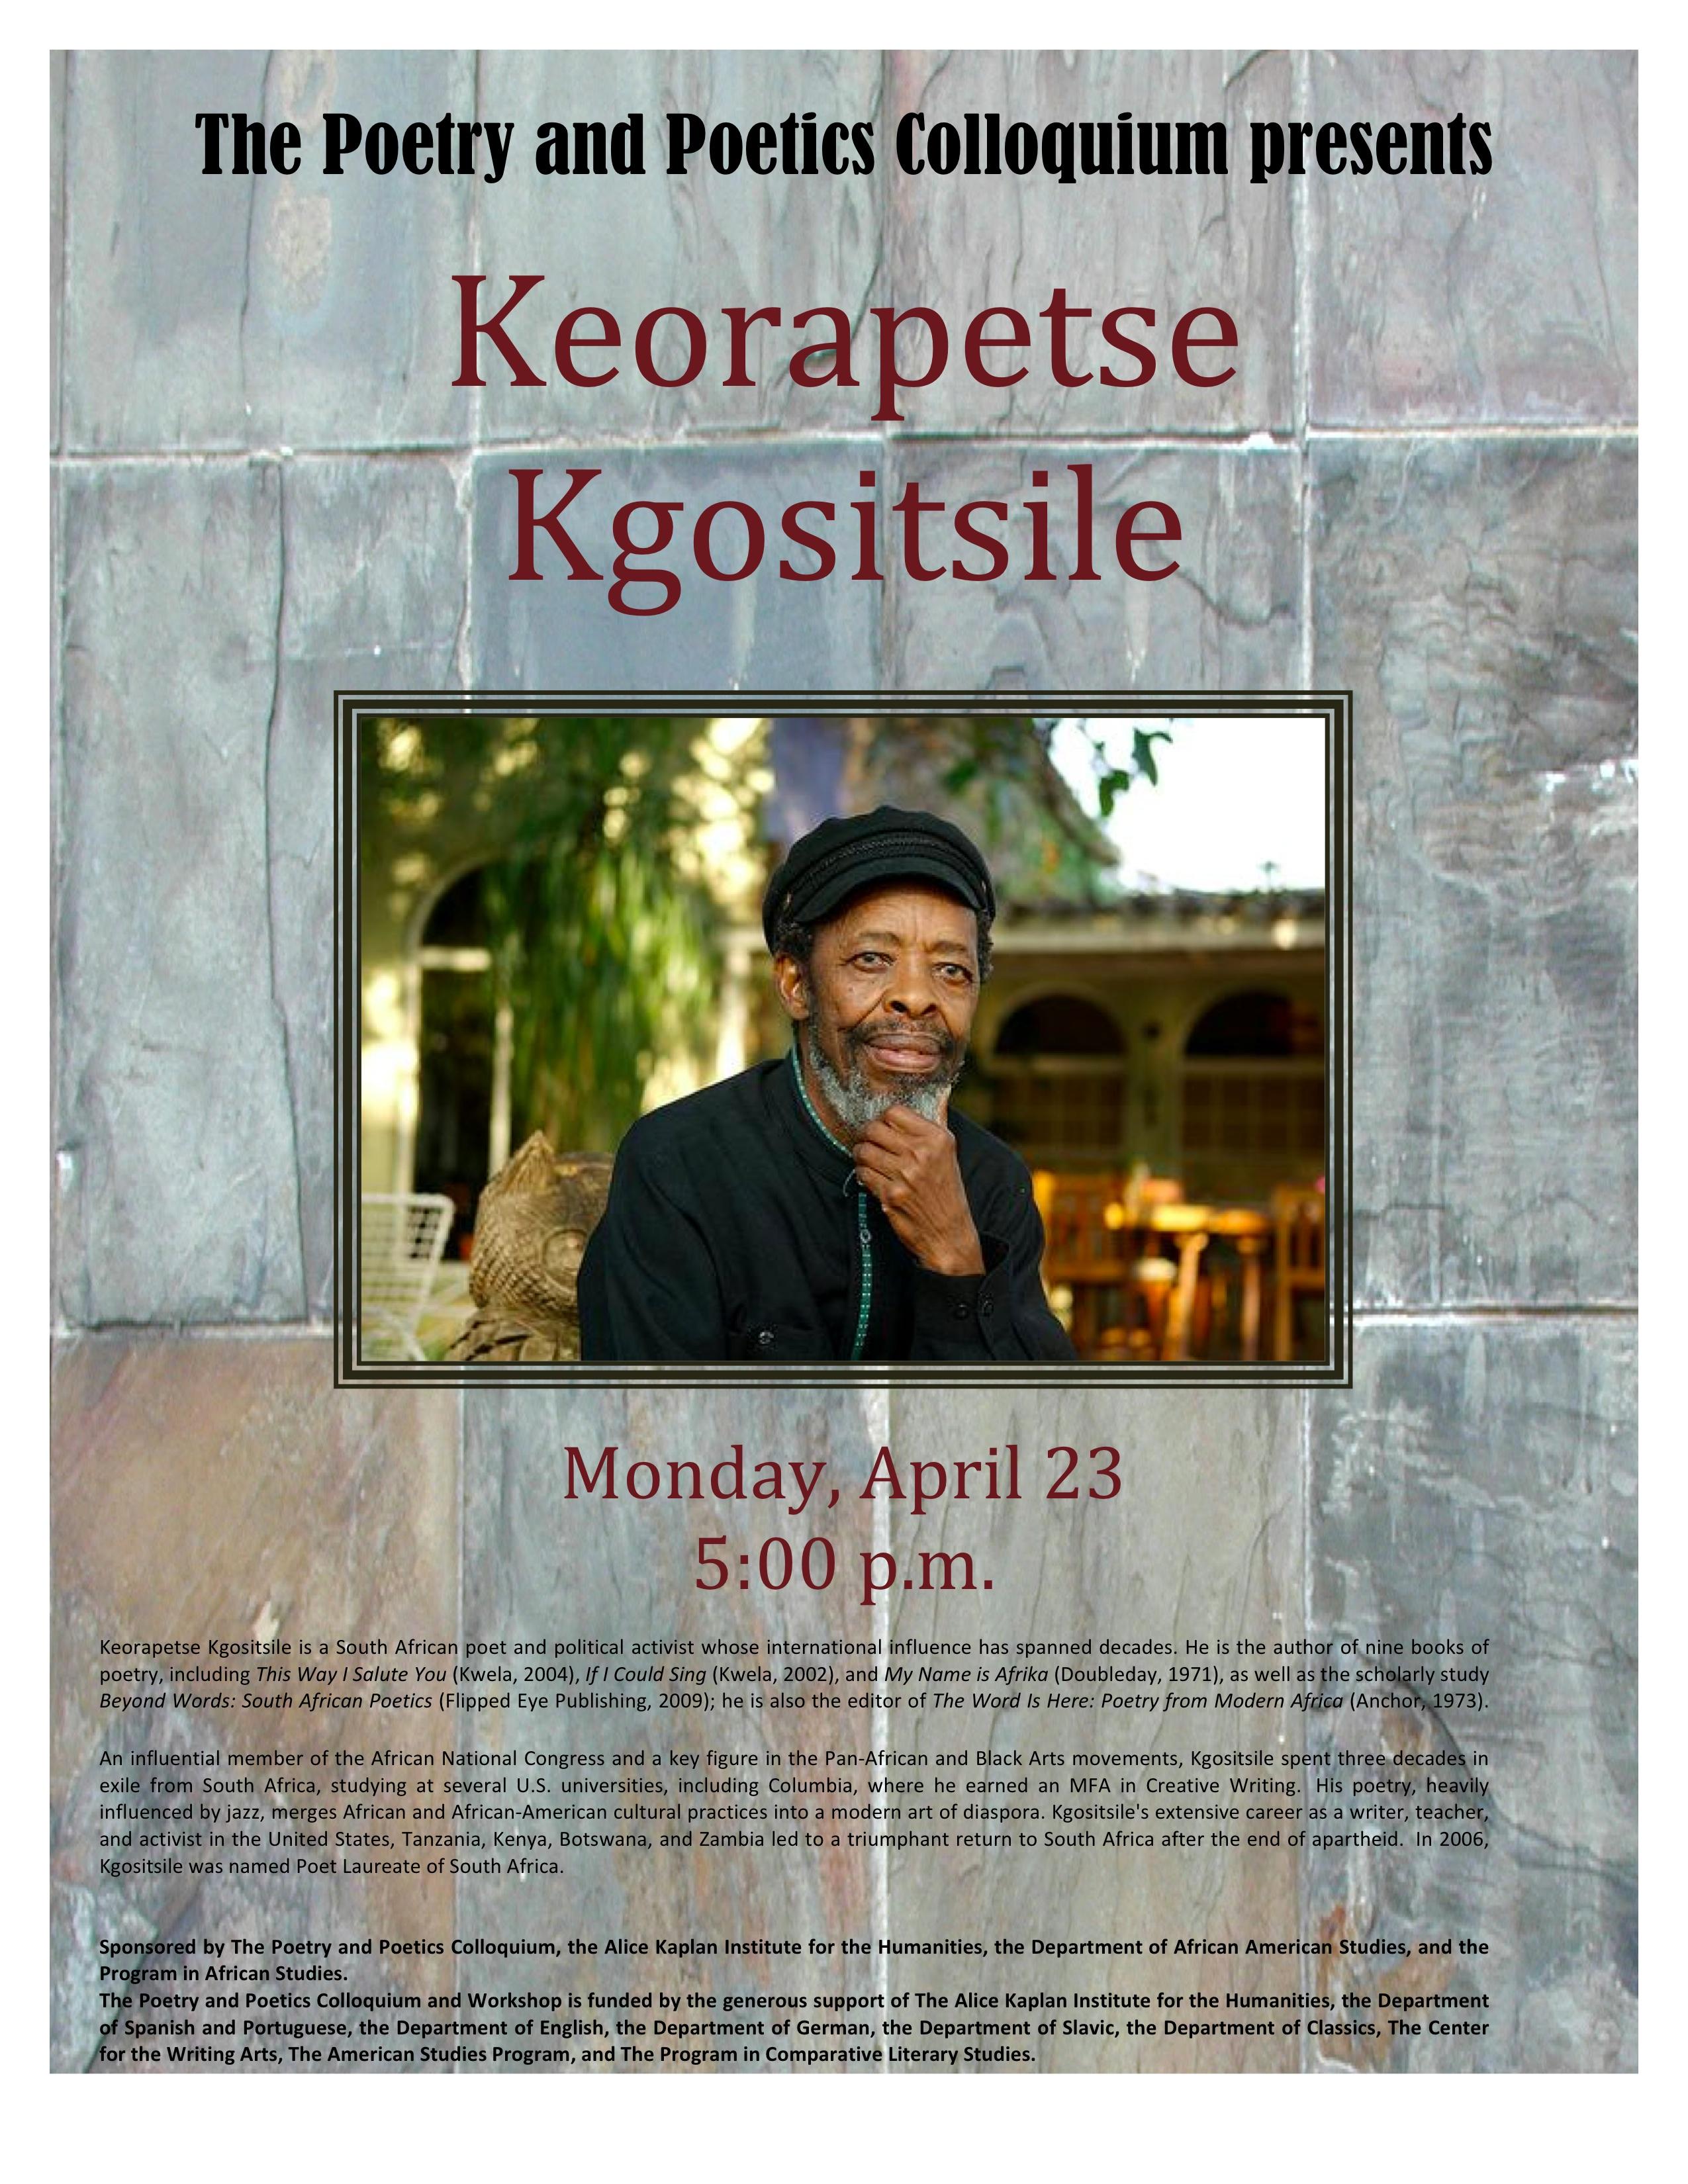 Kgositsile poster